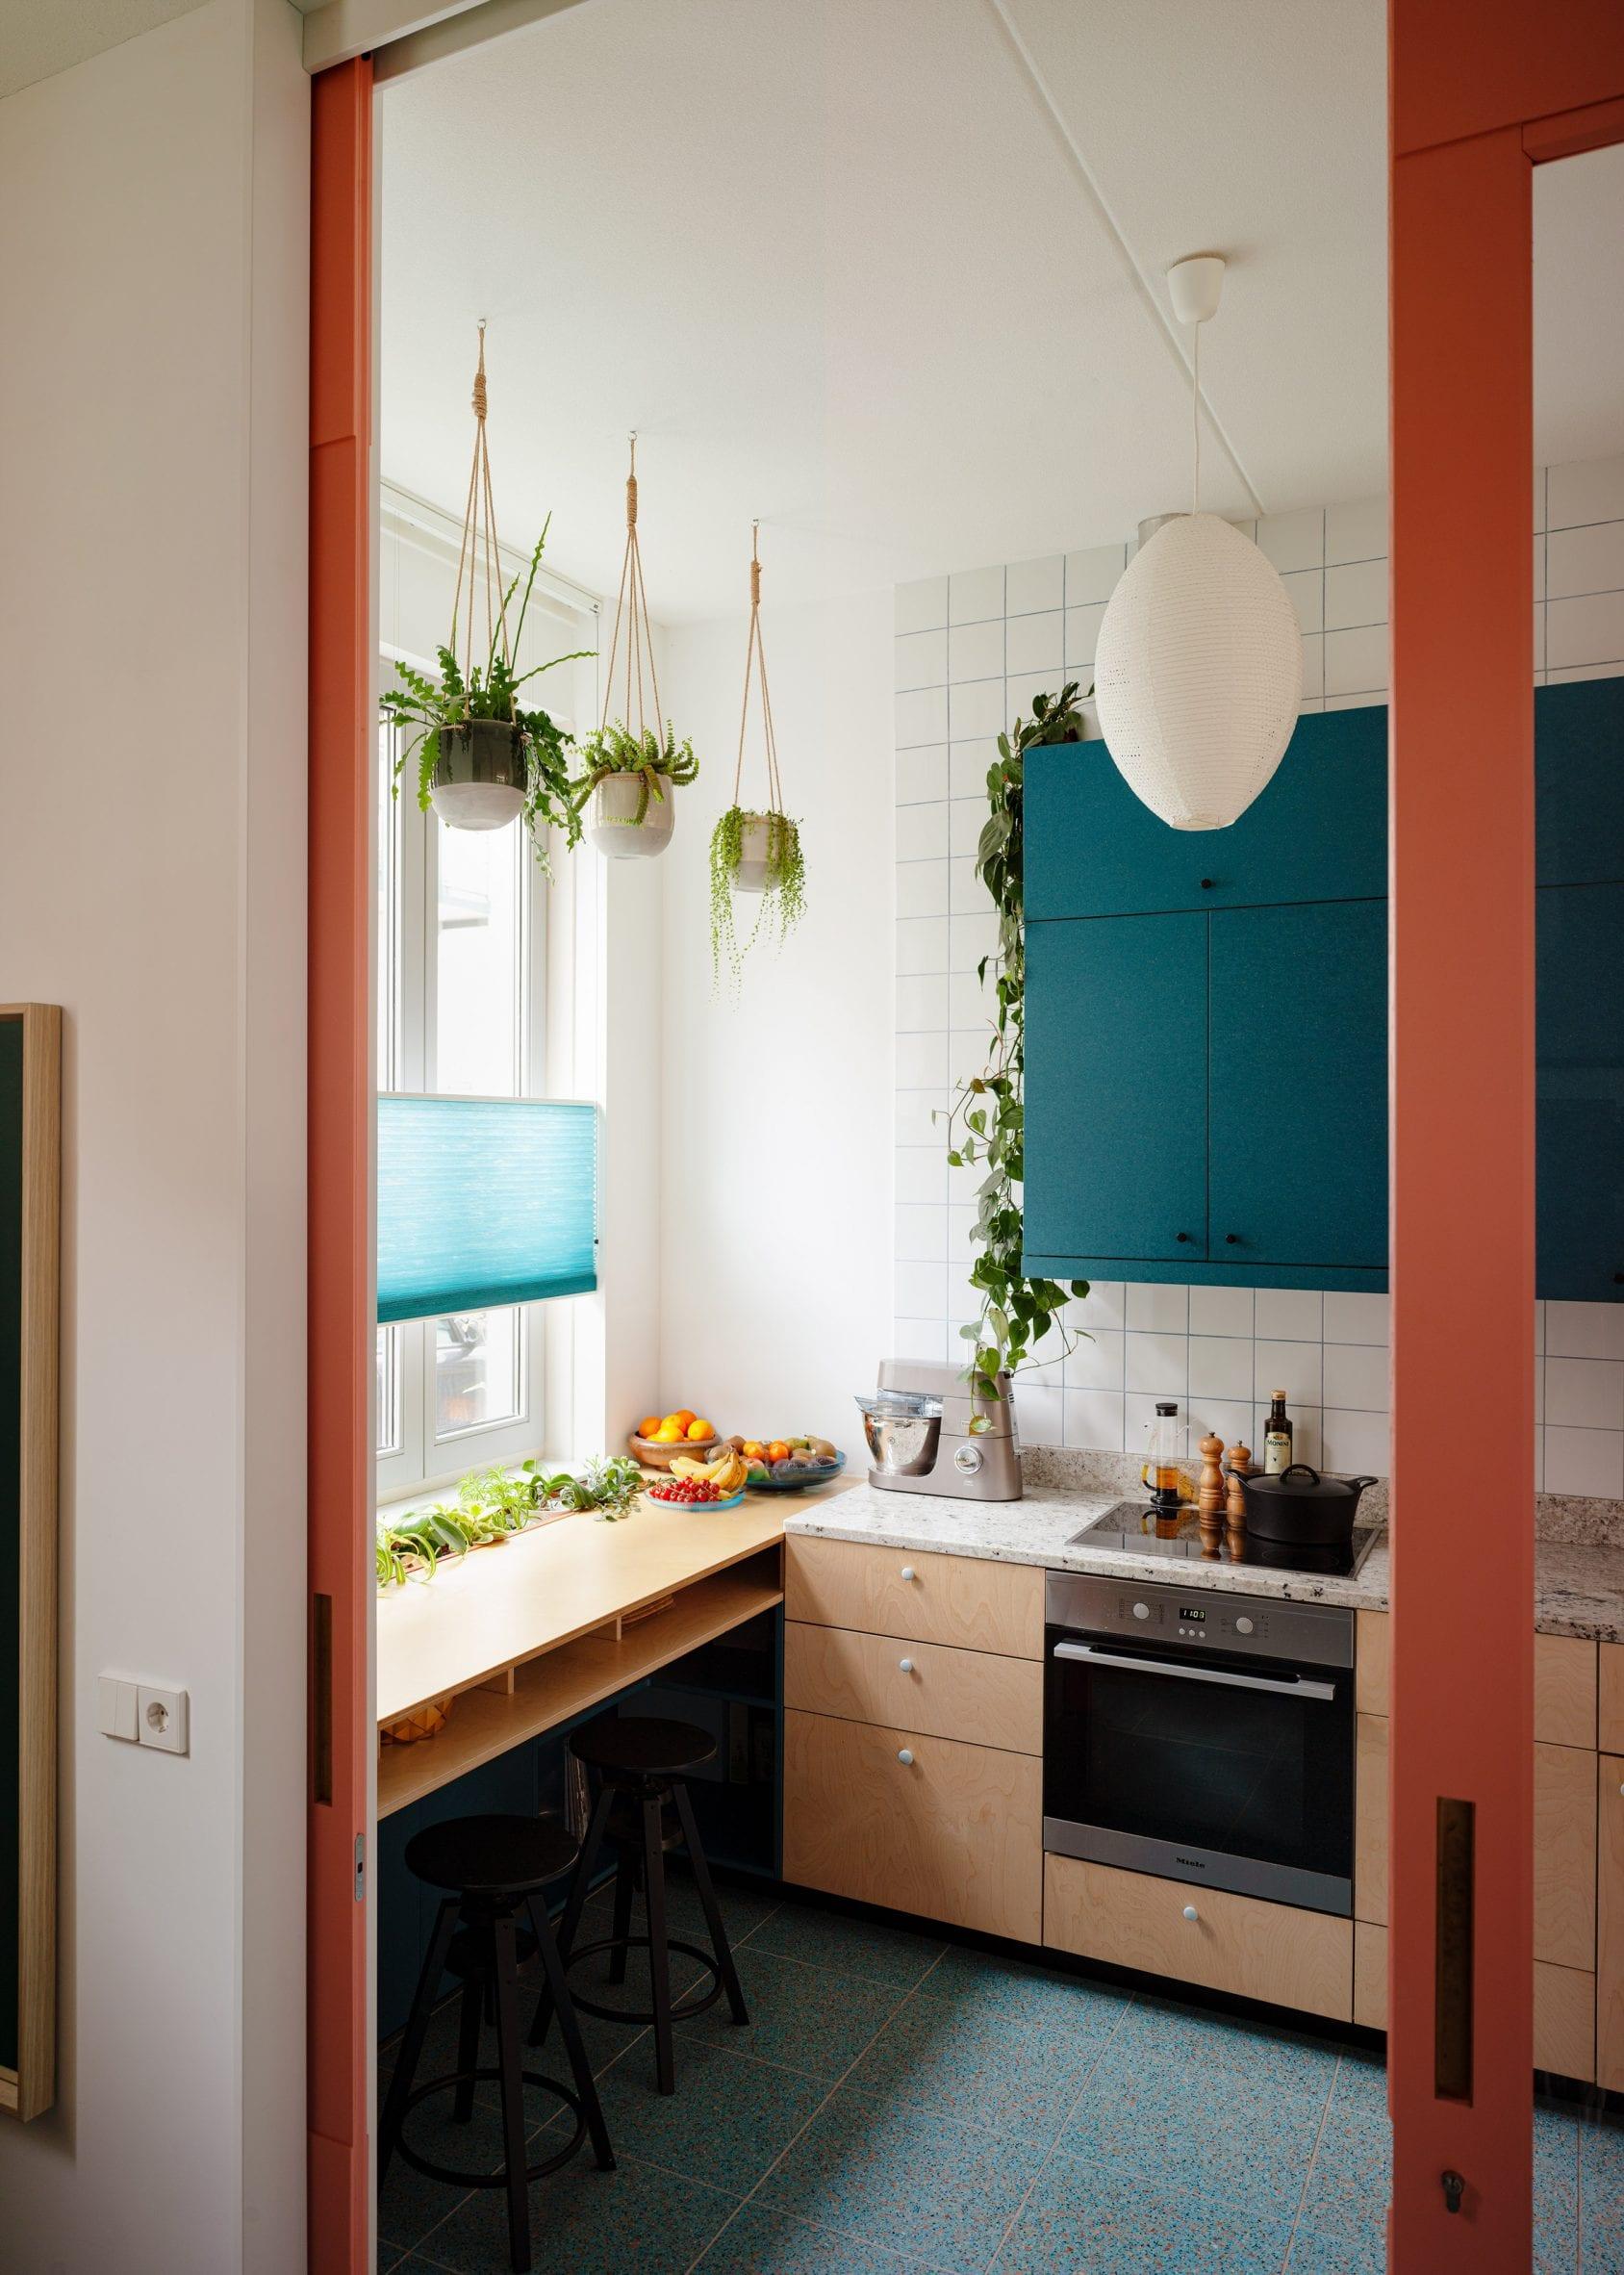 L-shaped kitchen by Lagado Architects